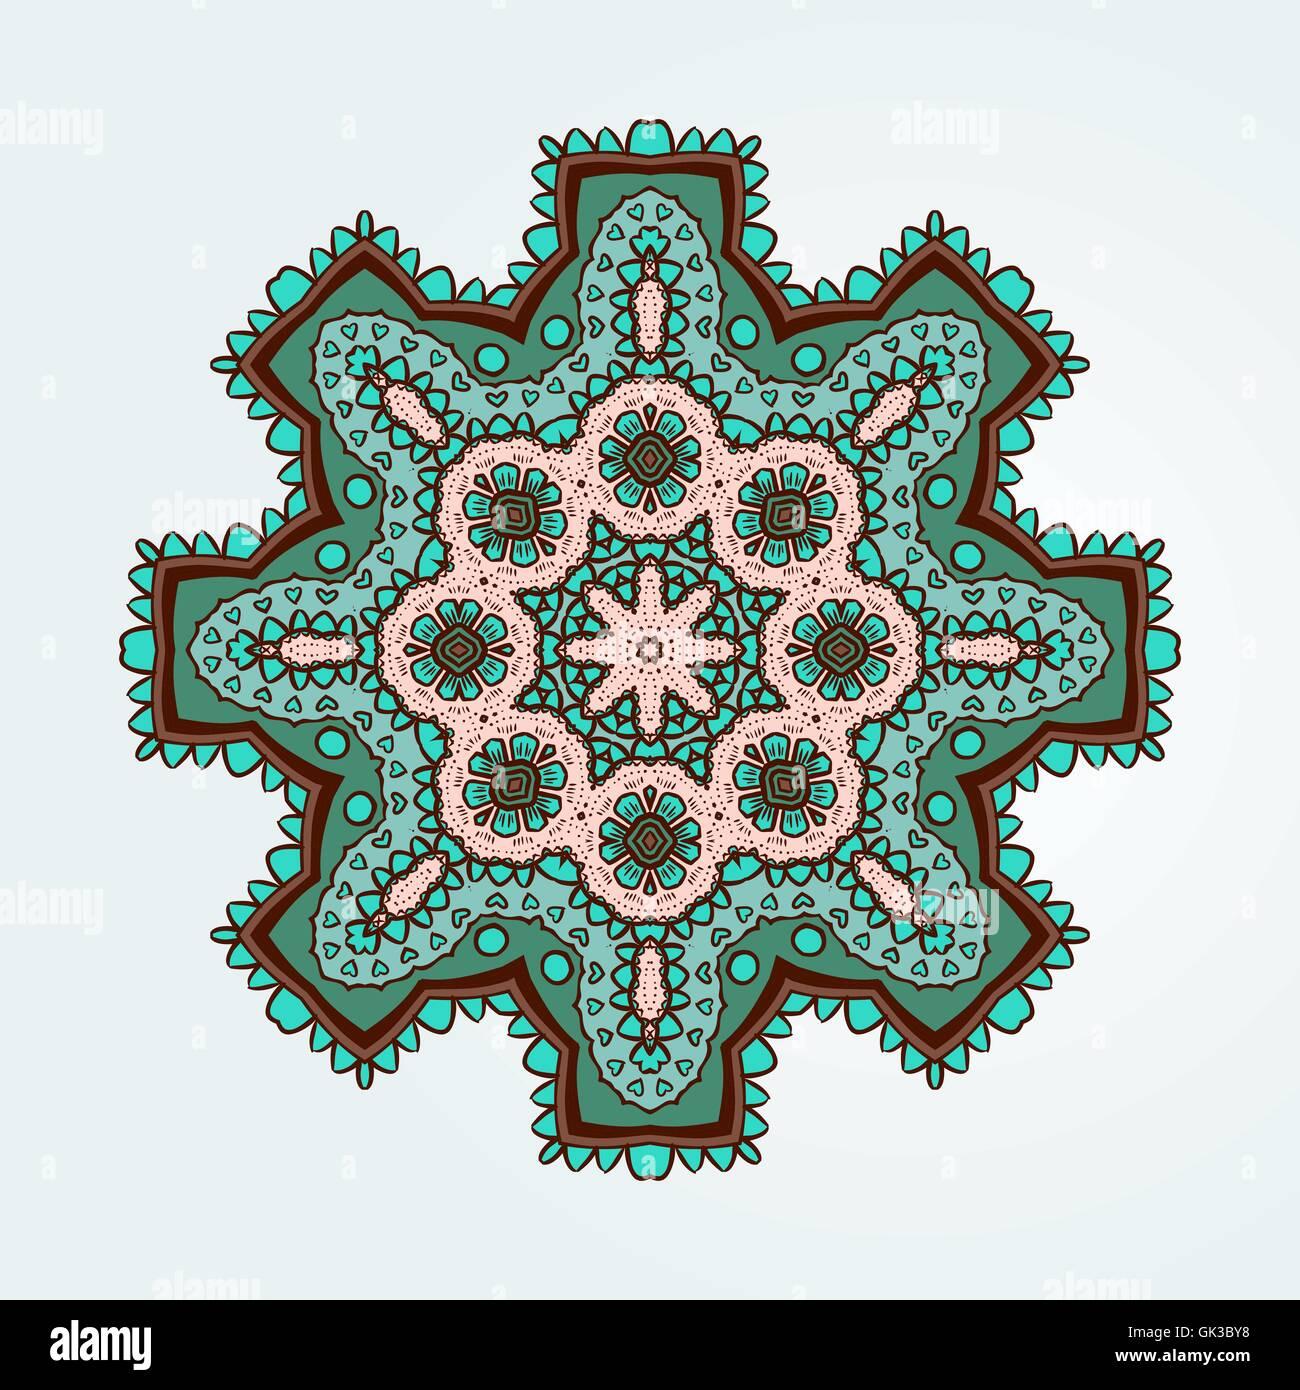 Buddhist Philosophy Mandala Colored Lotus Pattern On The Background Yoga Asanas And Meditation Indian Knowledge Asian